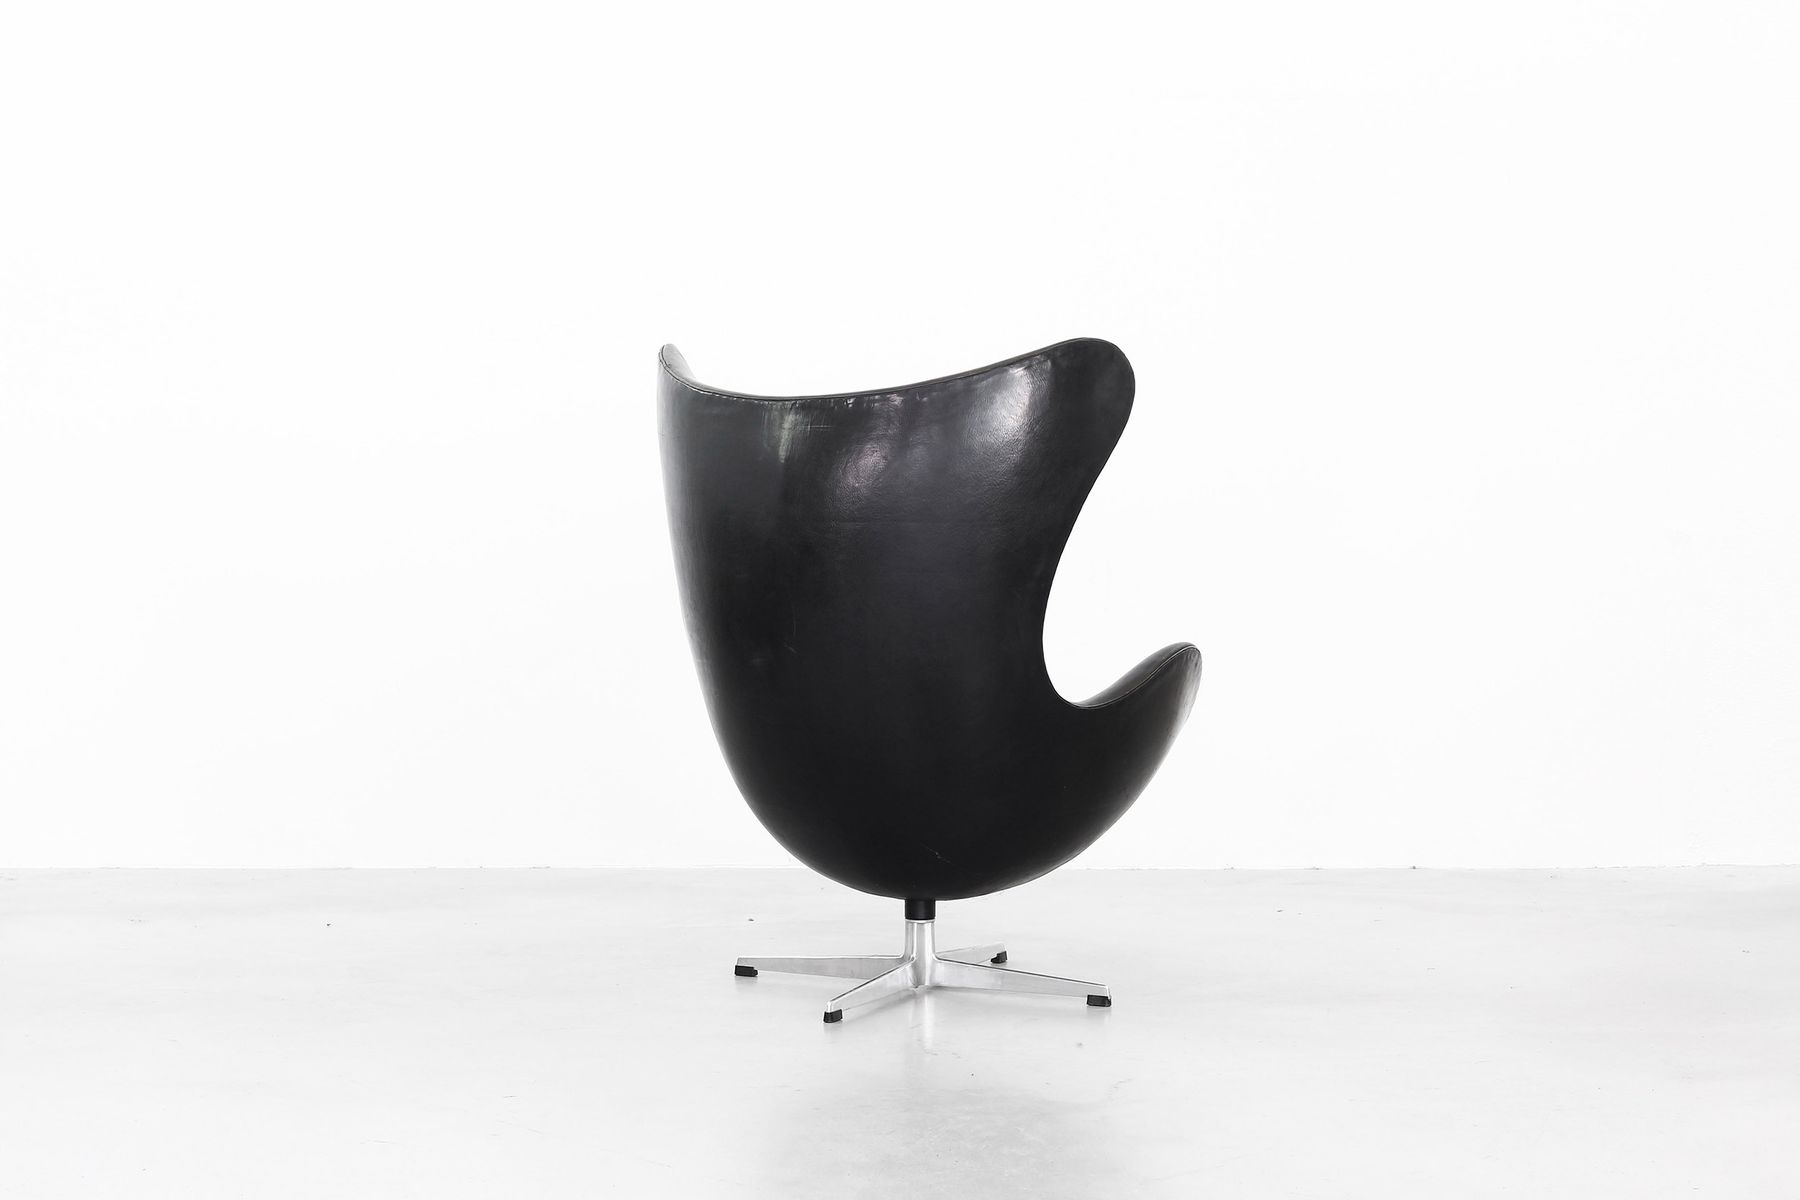 vintage egg chair by arne jacobsen for fritz hansen 1963 for sale at pamono. Black Bedroom Furniture Sets. Home Design Ideas